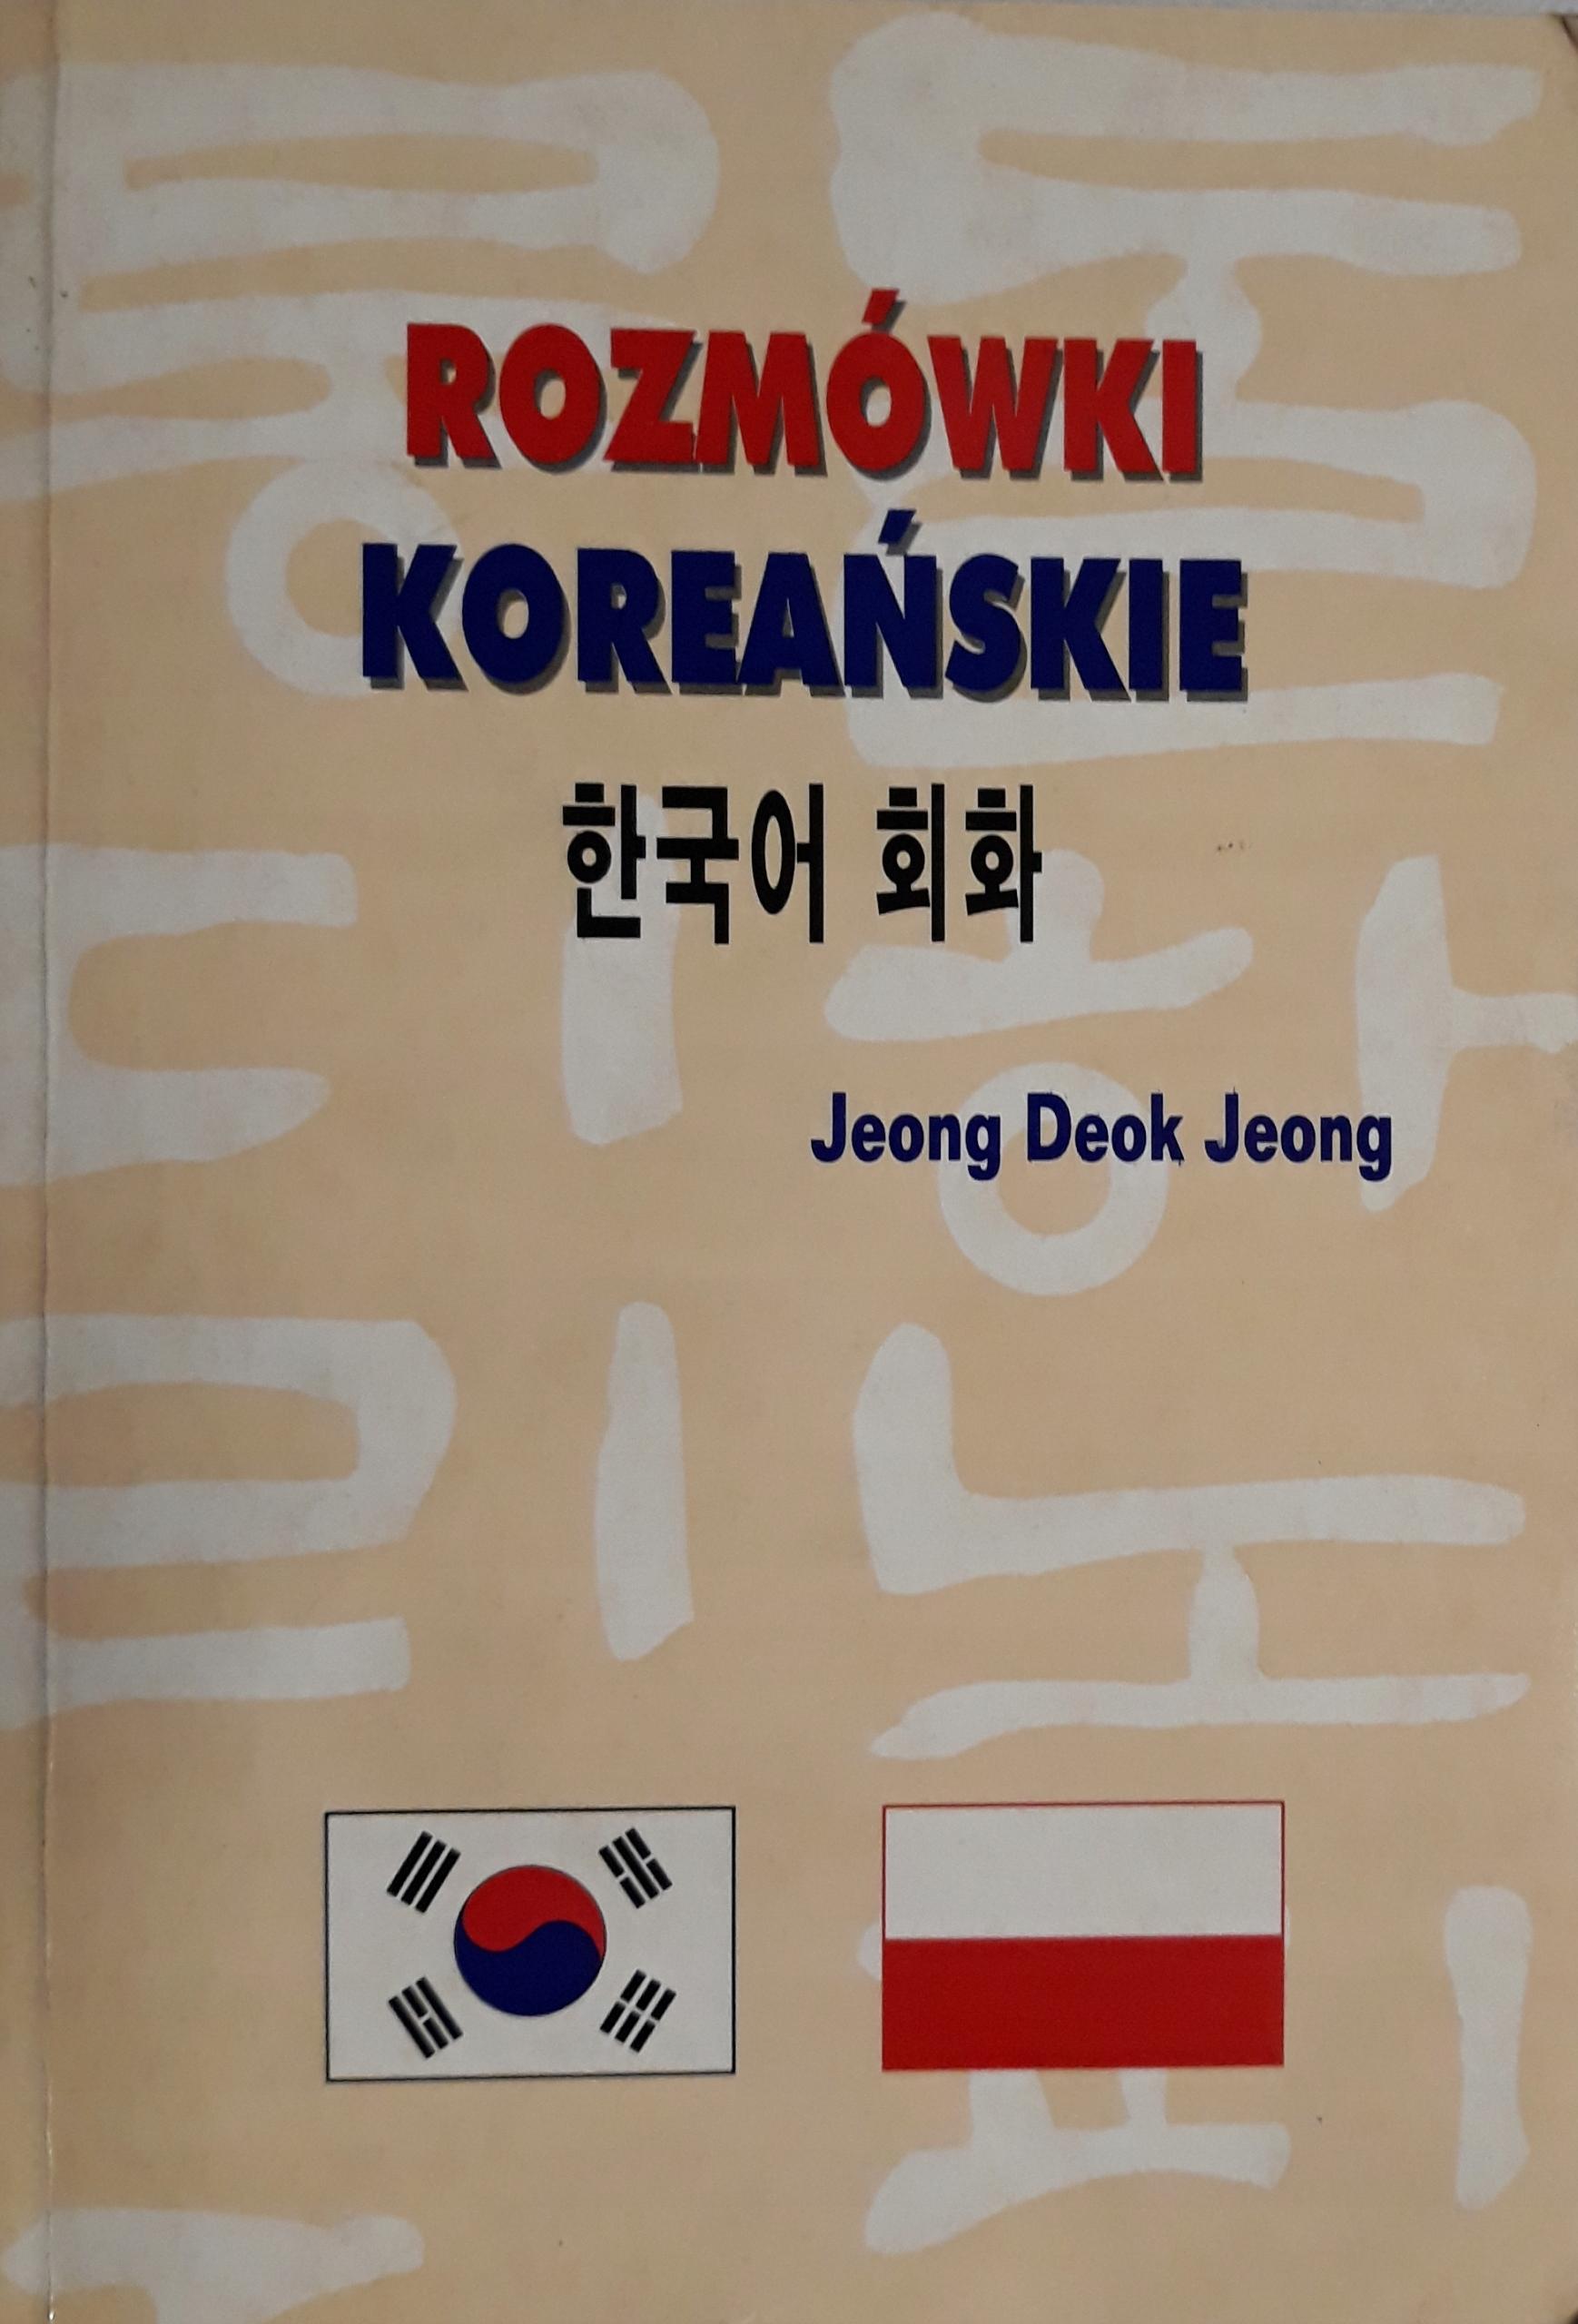 Rozmówki koreańskie Jeong